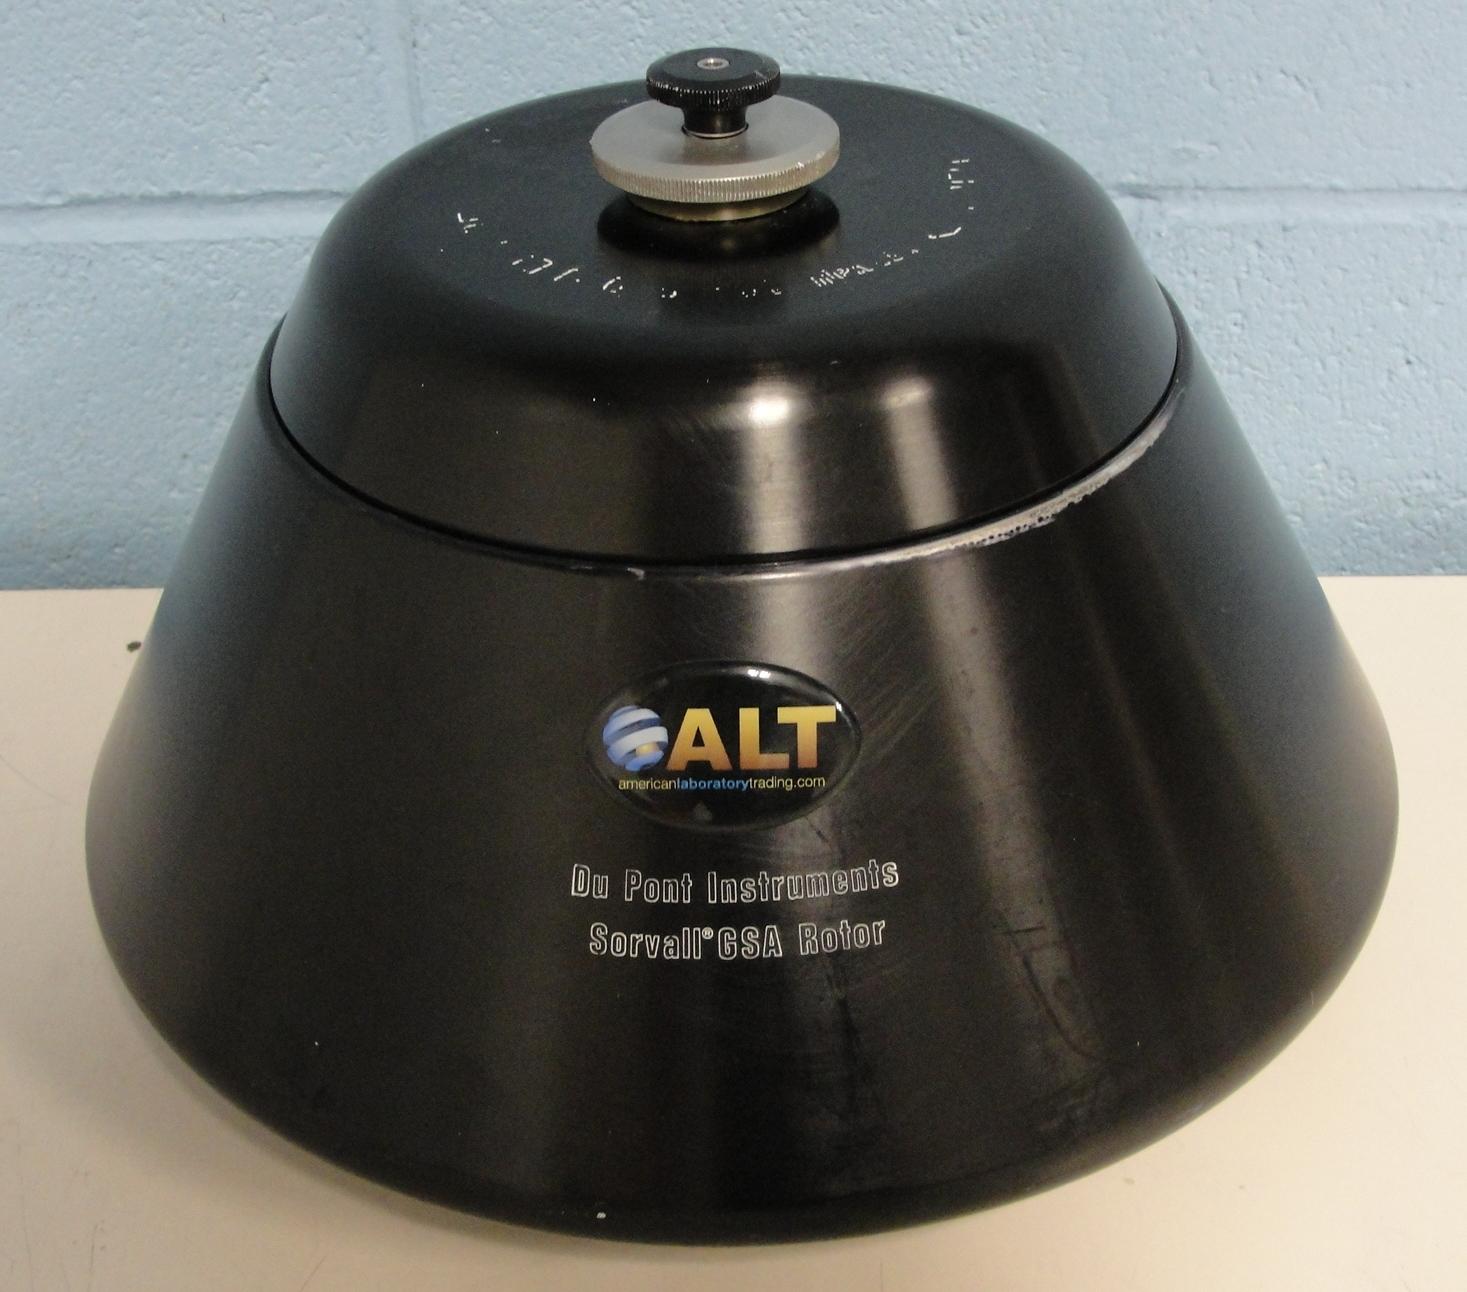 Sorvall GSA Rotor Image